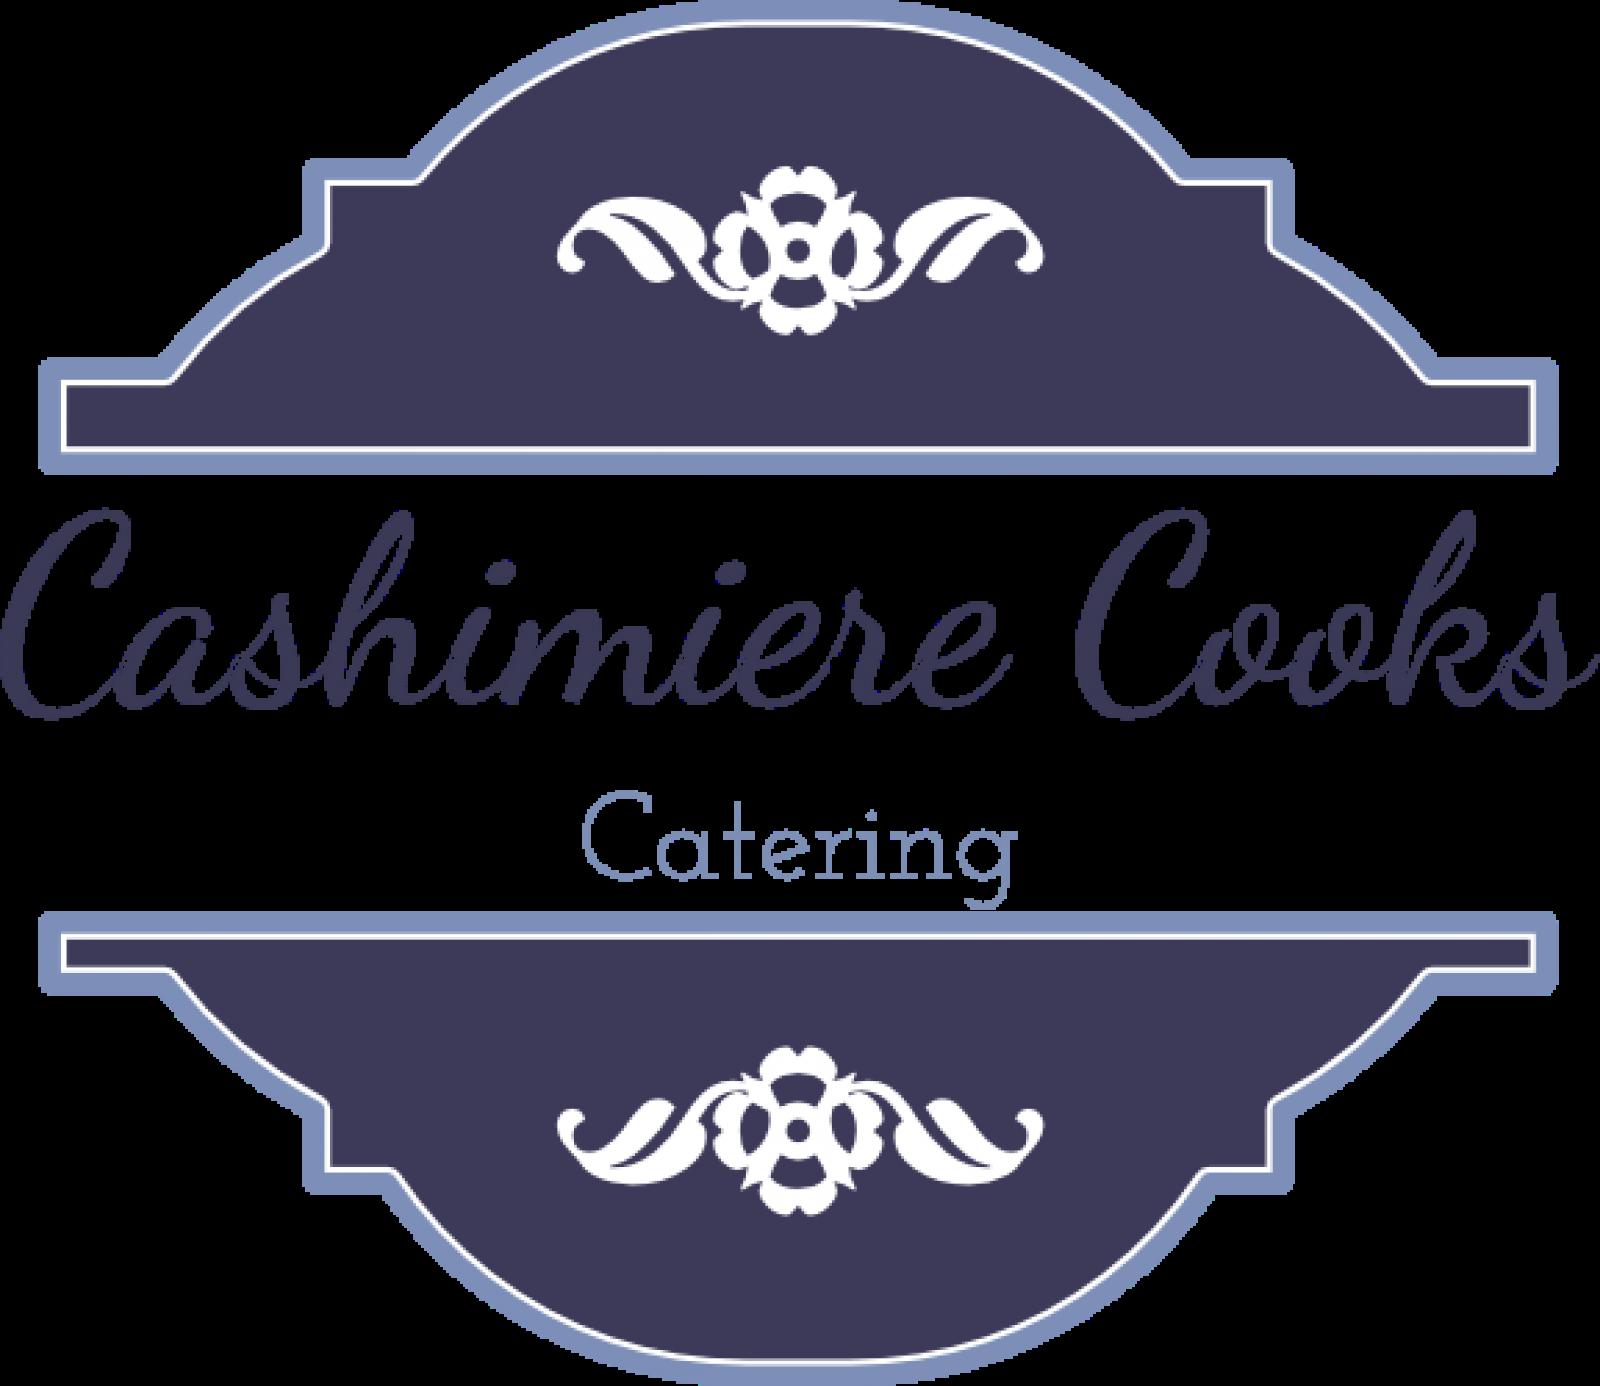 Cashimiere Cooks